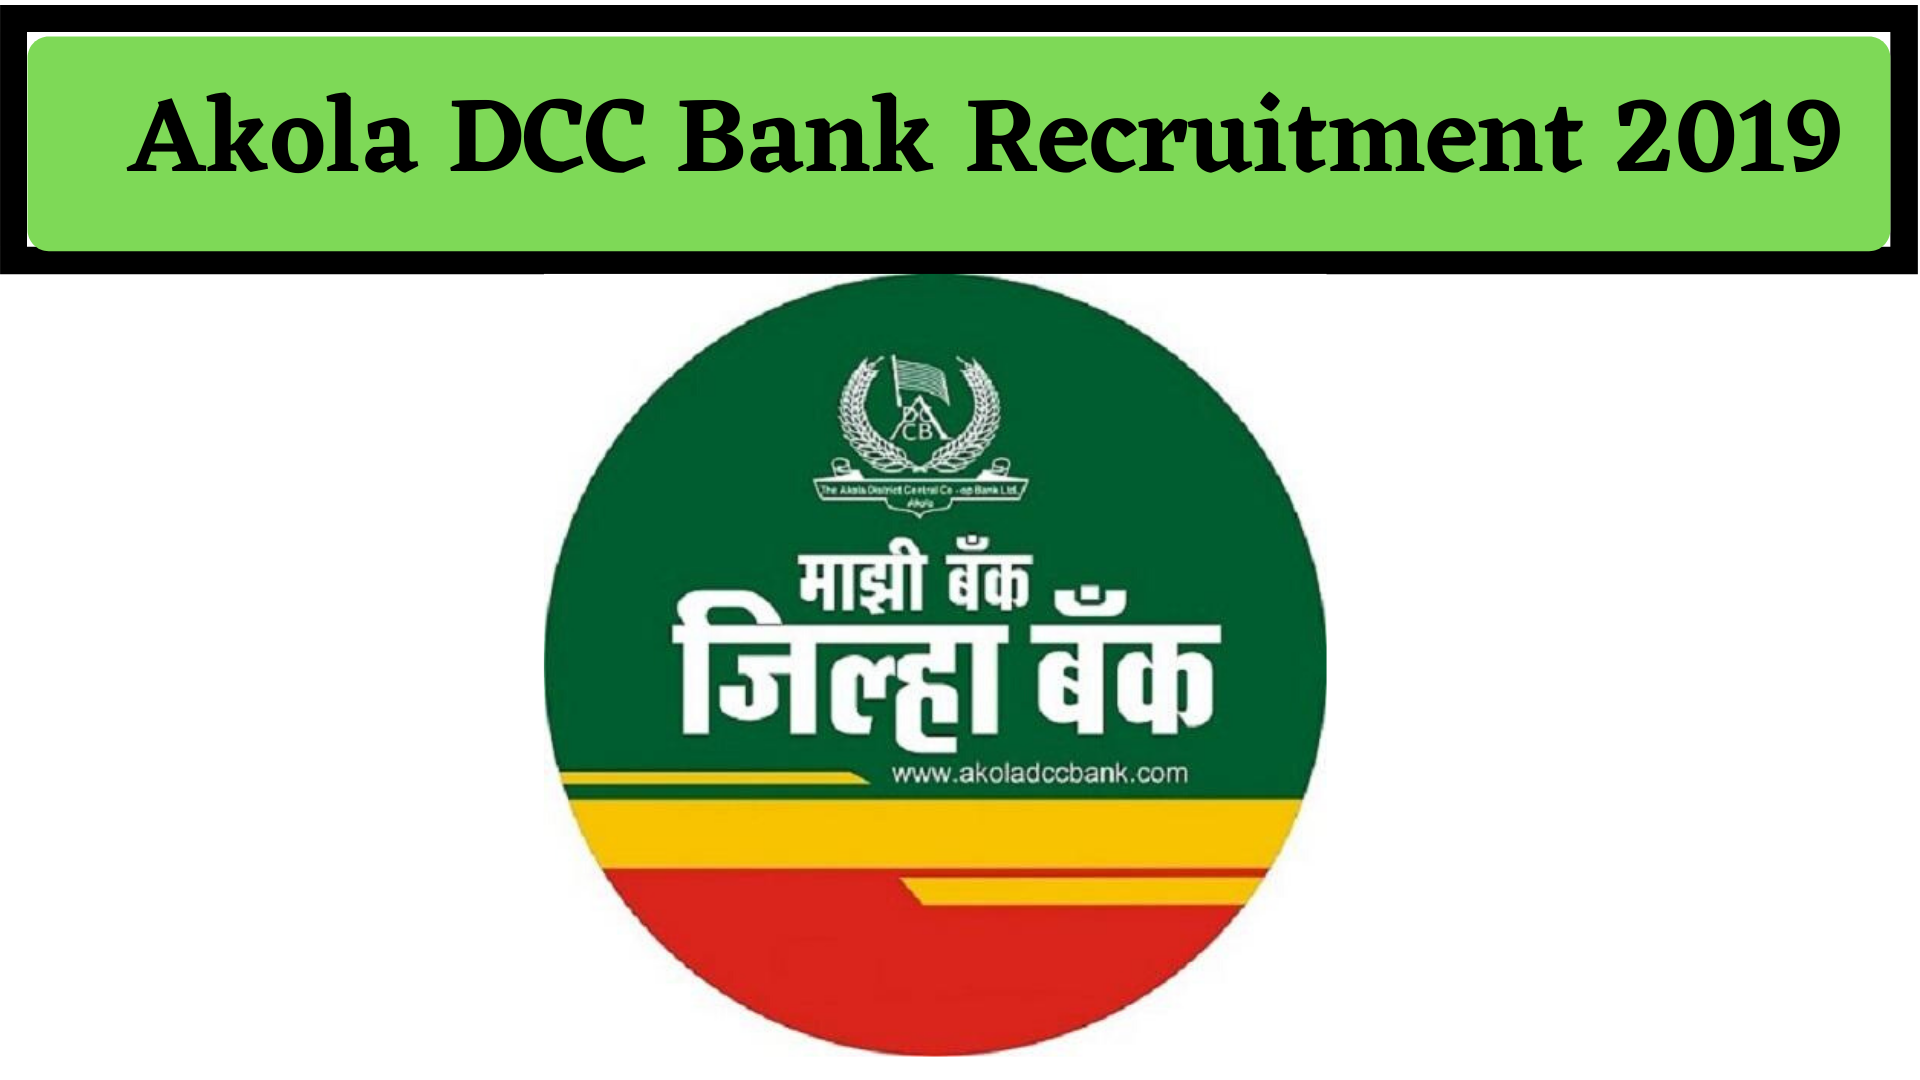 Akola DCC Bank Recruitment 2019, Apply online for 75 Clerk ...